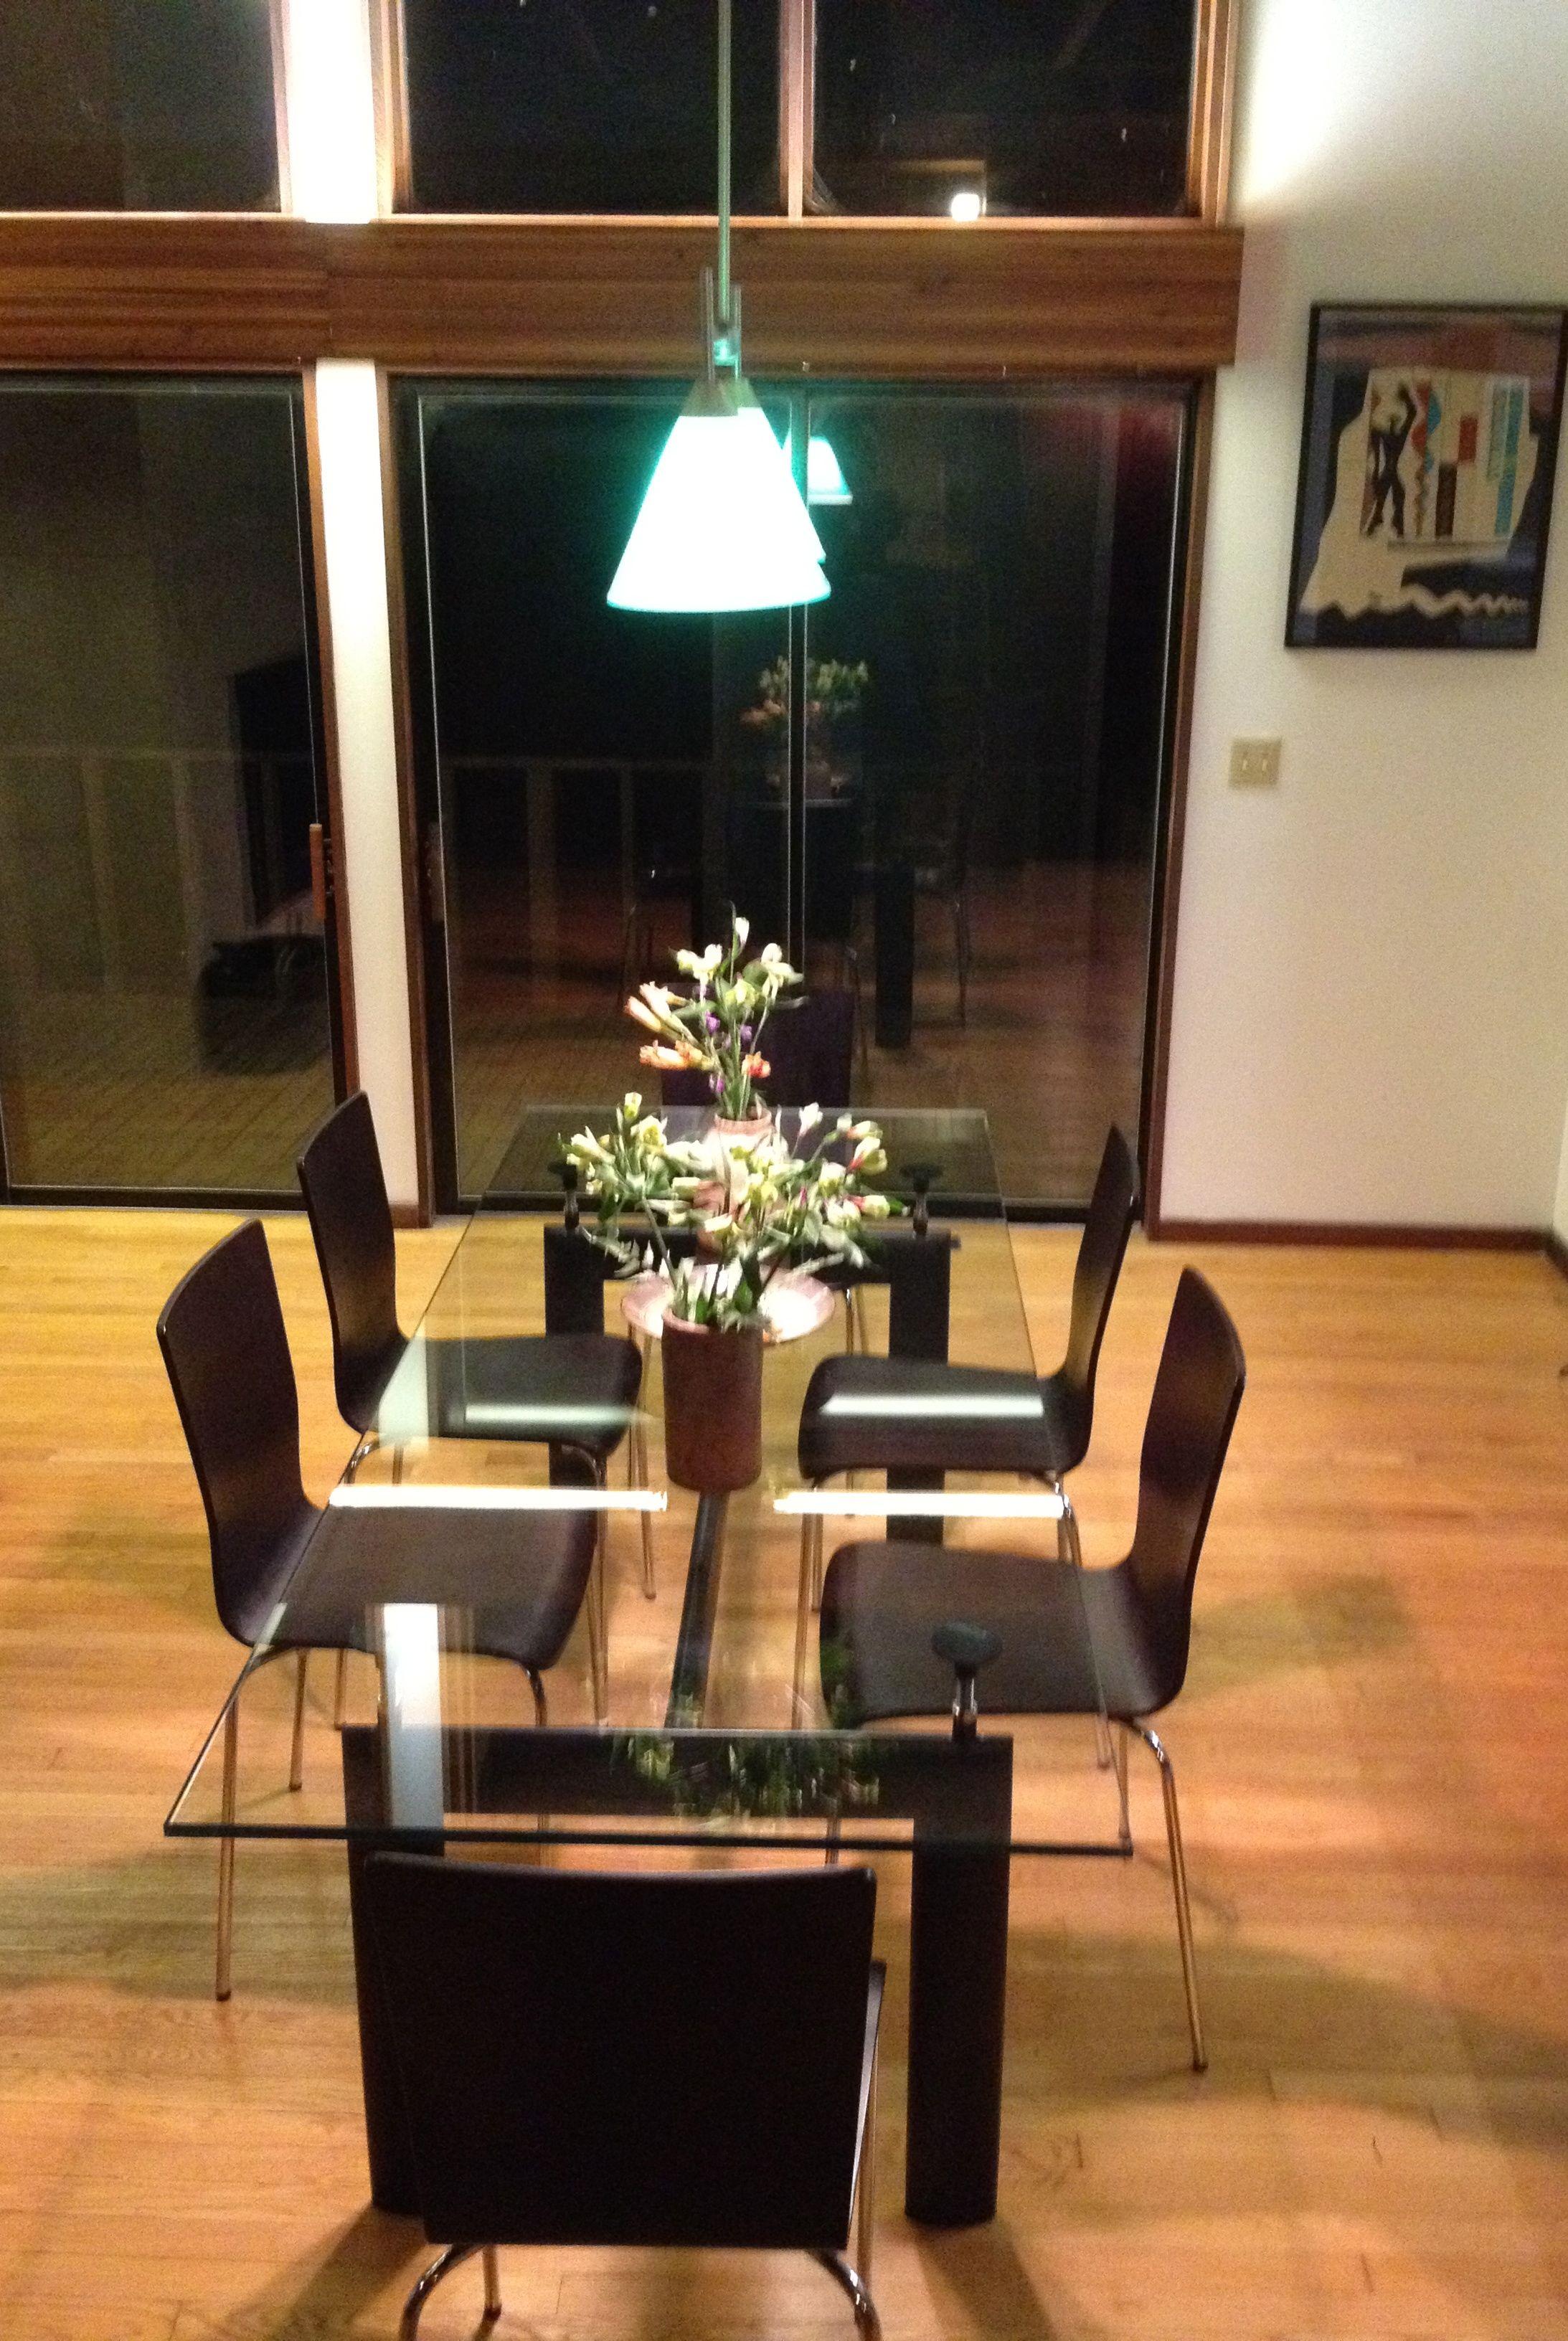 Le corbusier lc6 dining table images le corbusier coffee table images fron - Decoration le corbusier ...